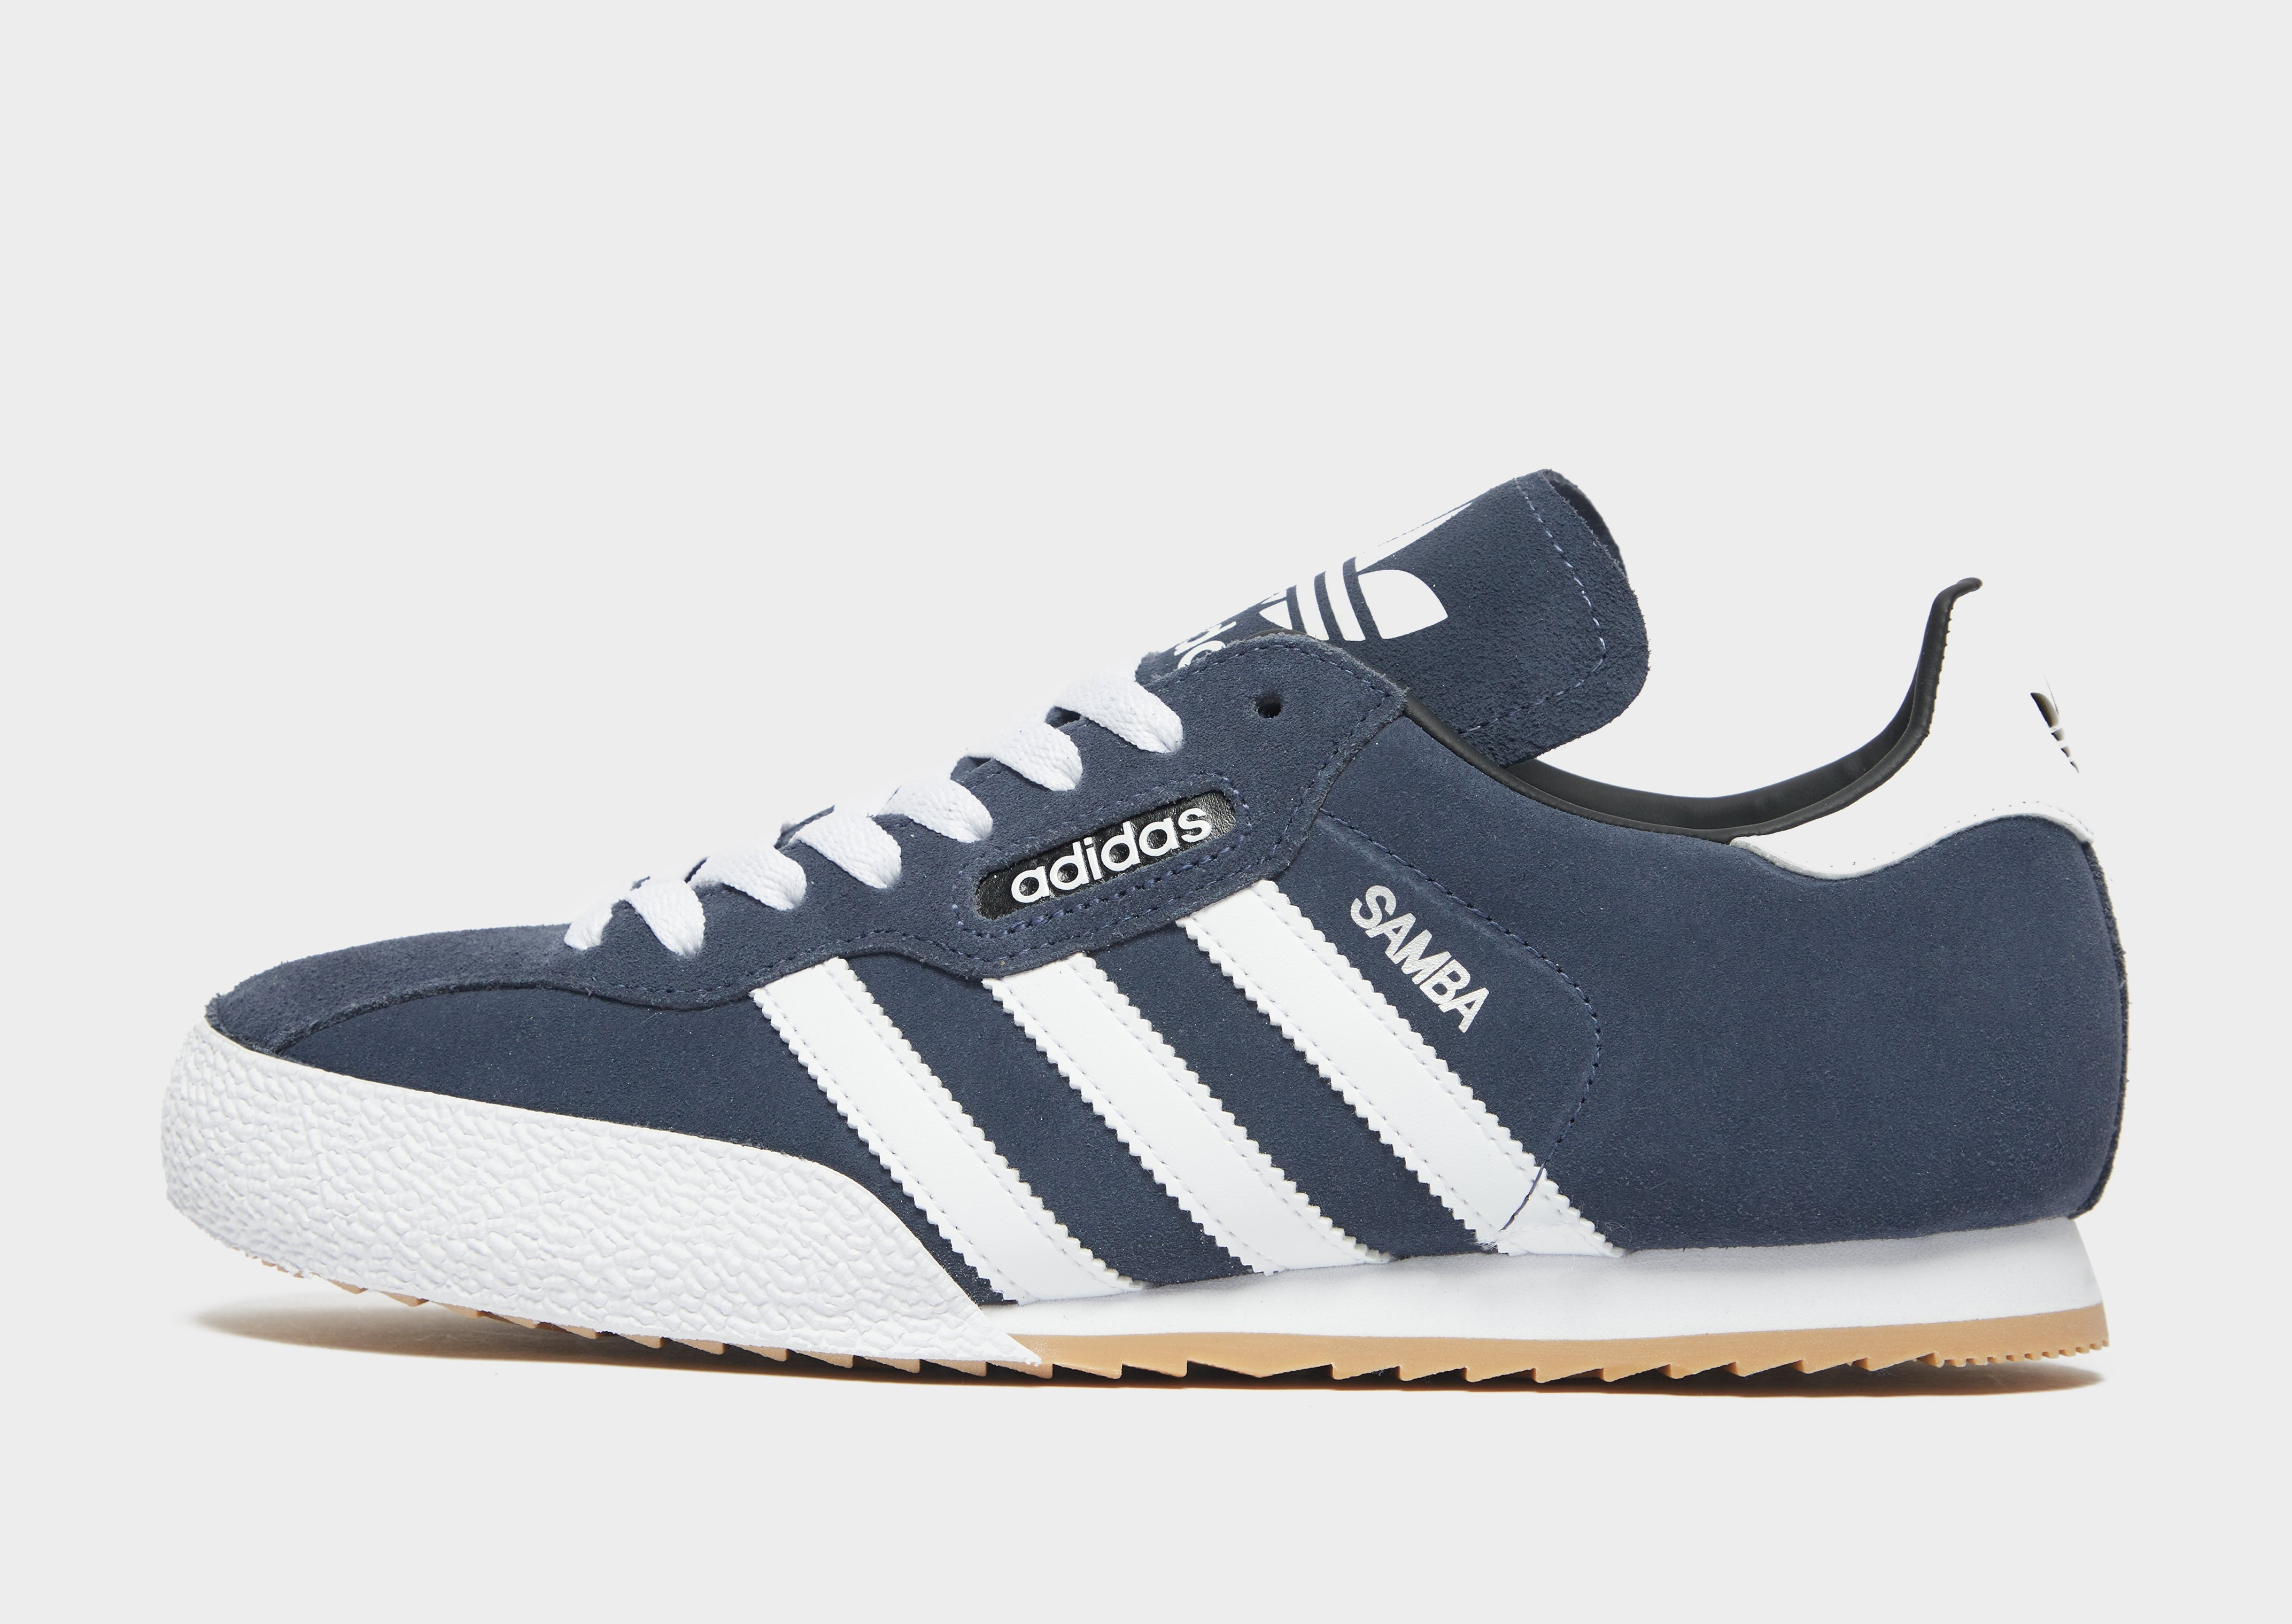 Renkliayaklar.net | Adidas sneakers, Adidas samba sneakers